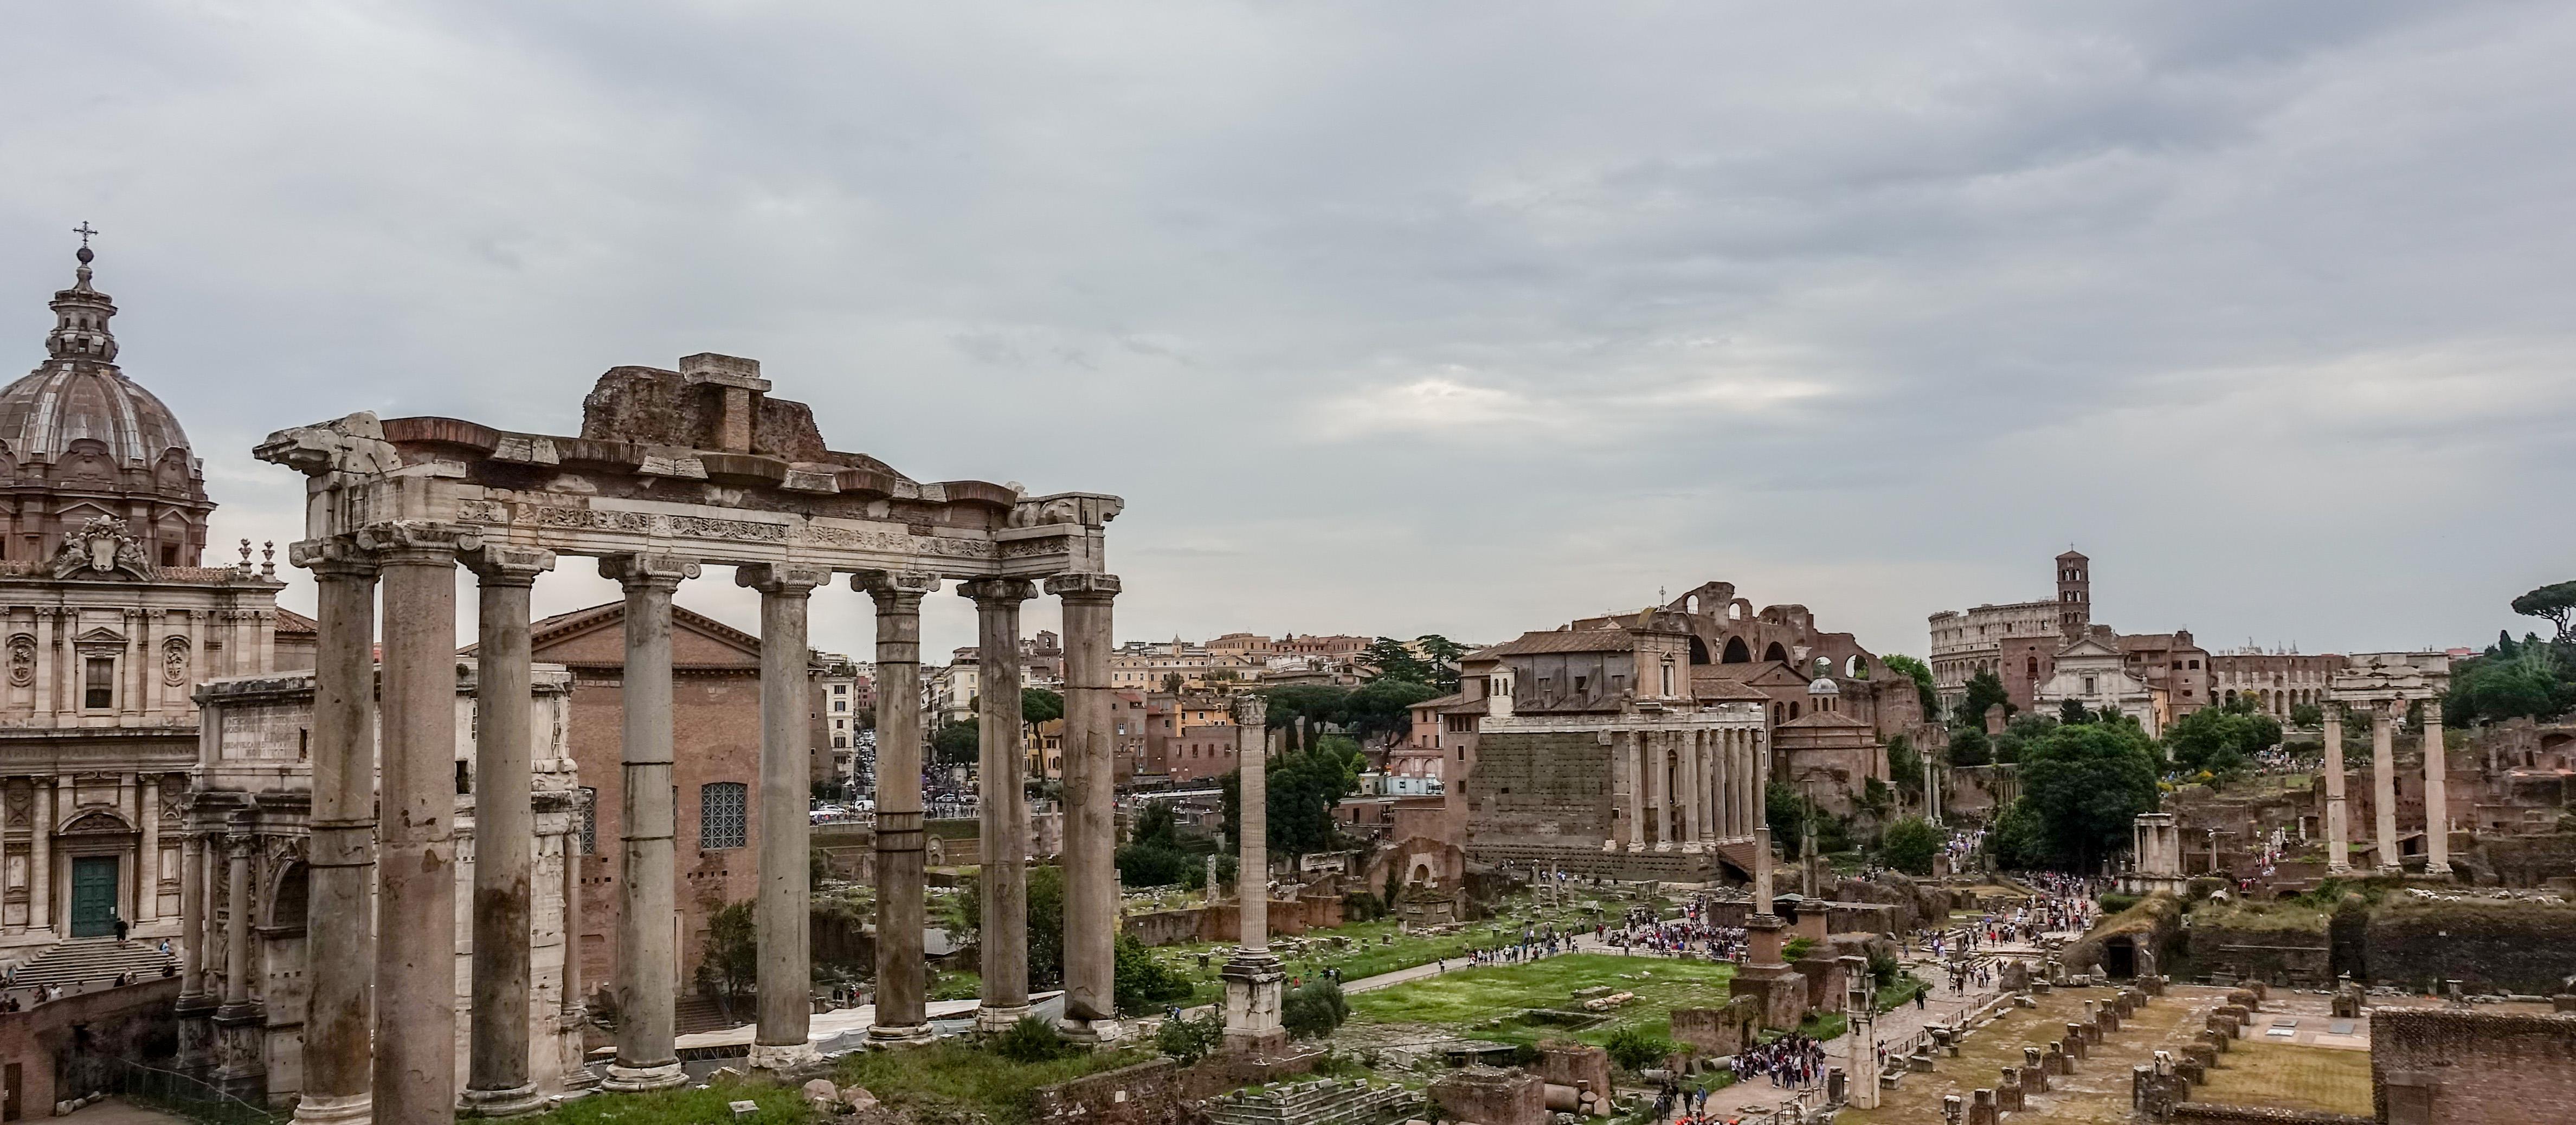 The Roman Forum, an ancient marketplace